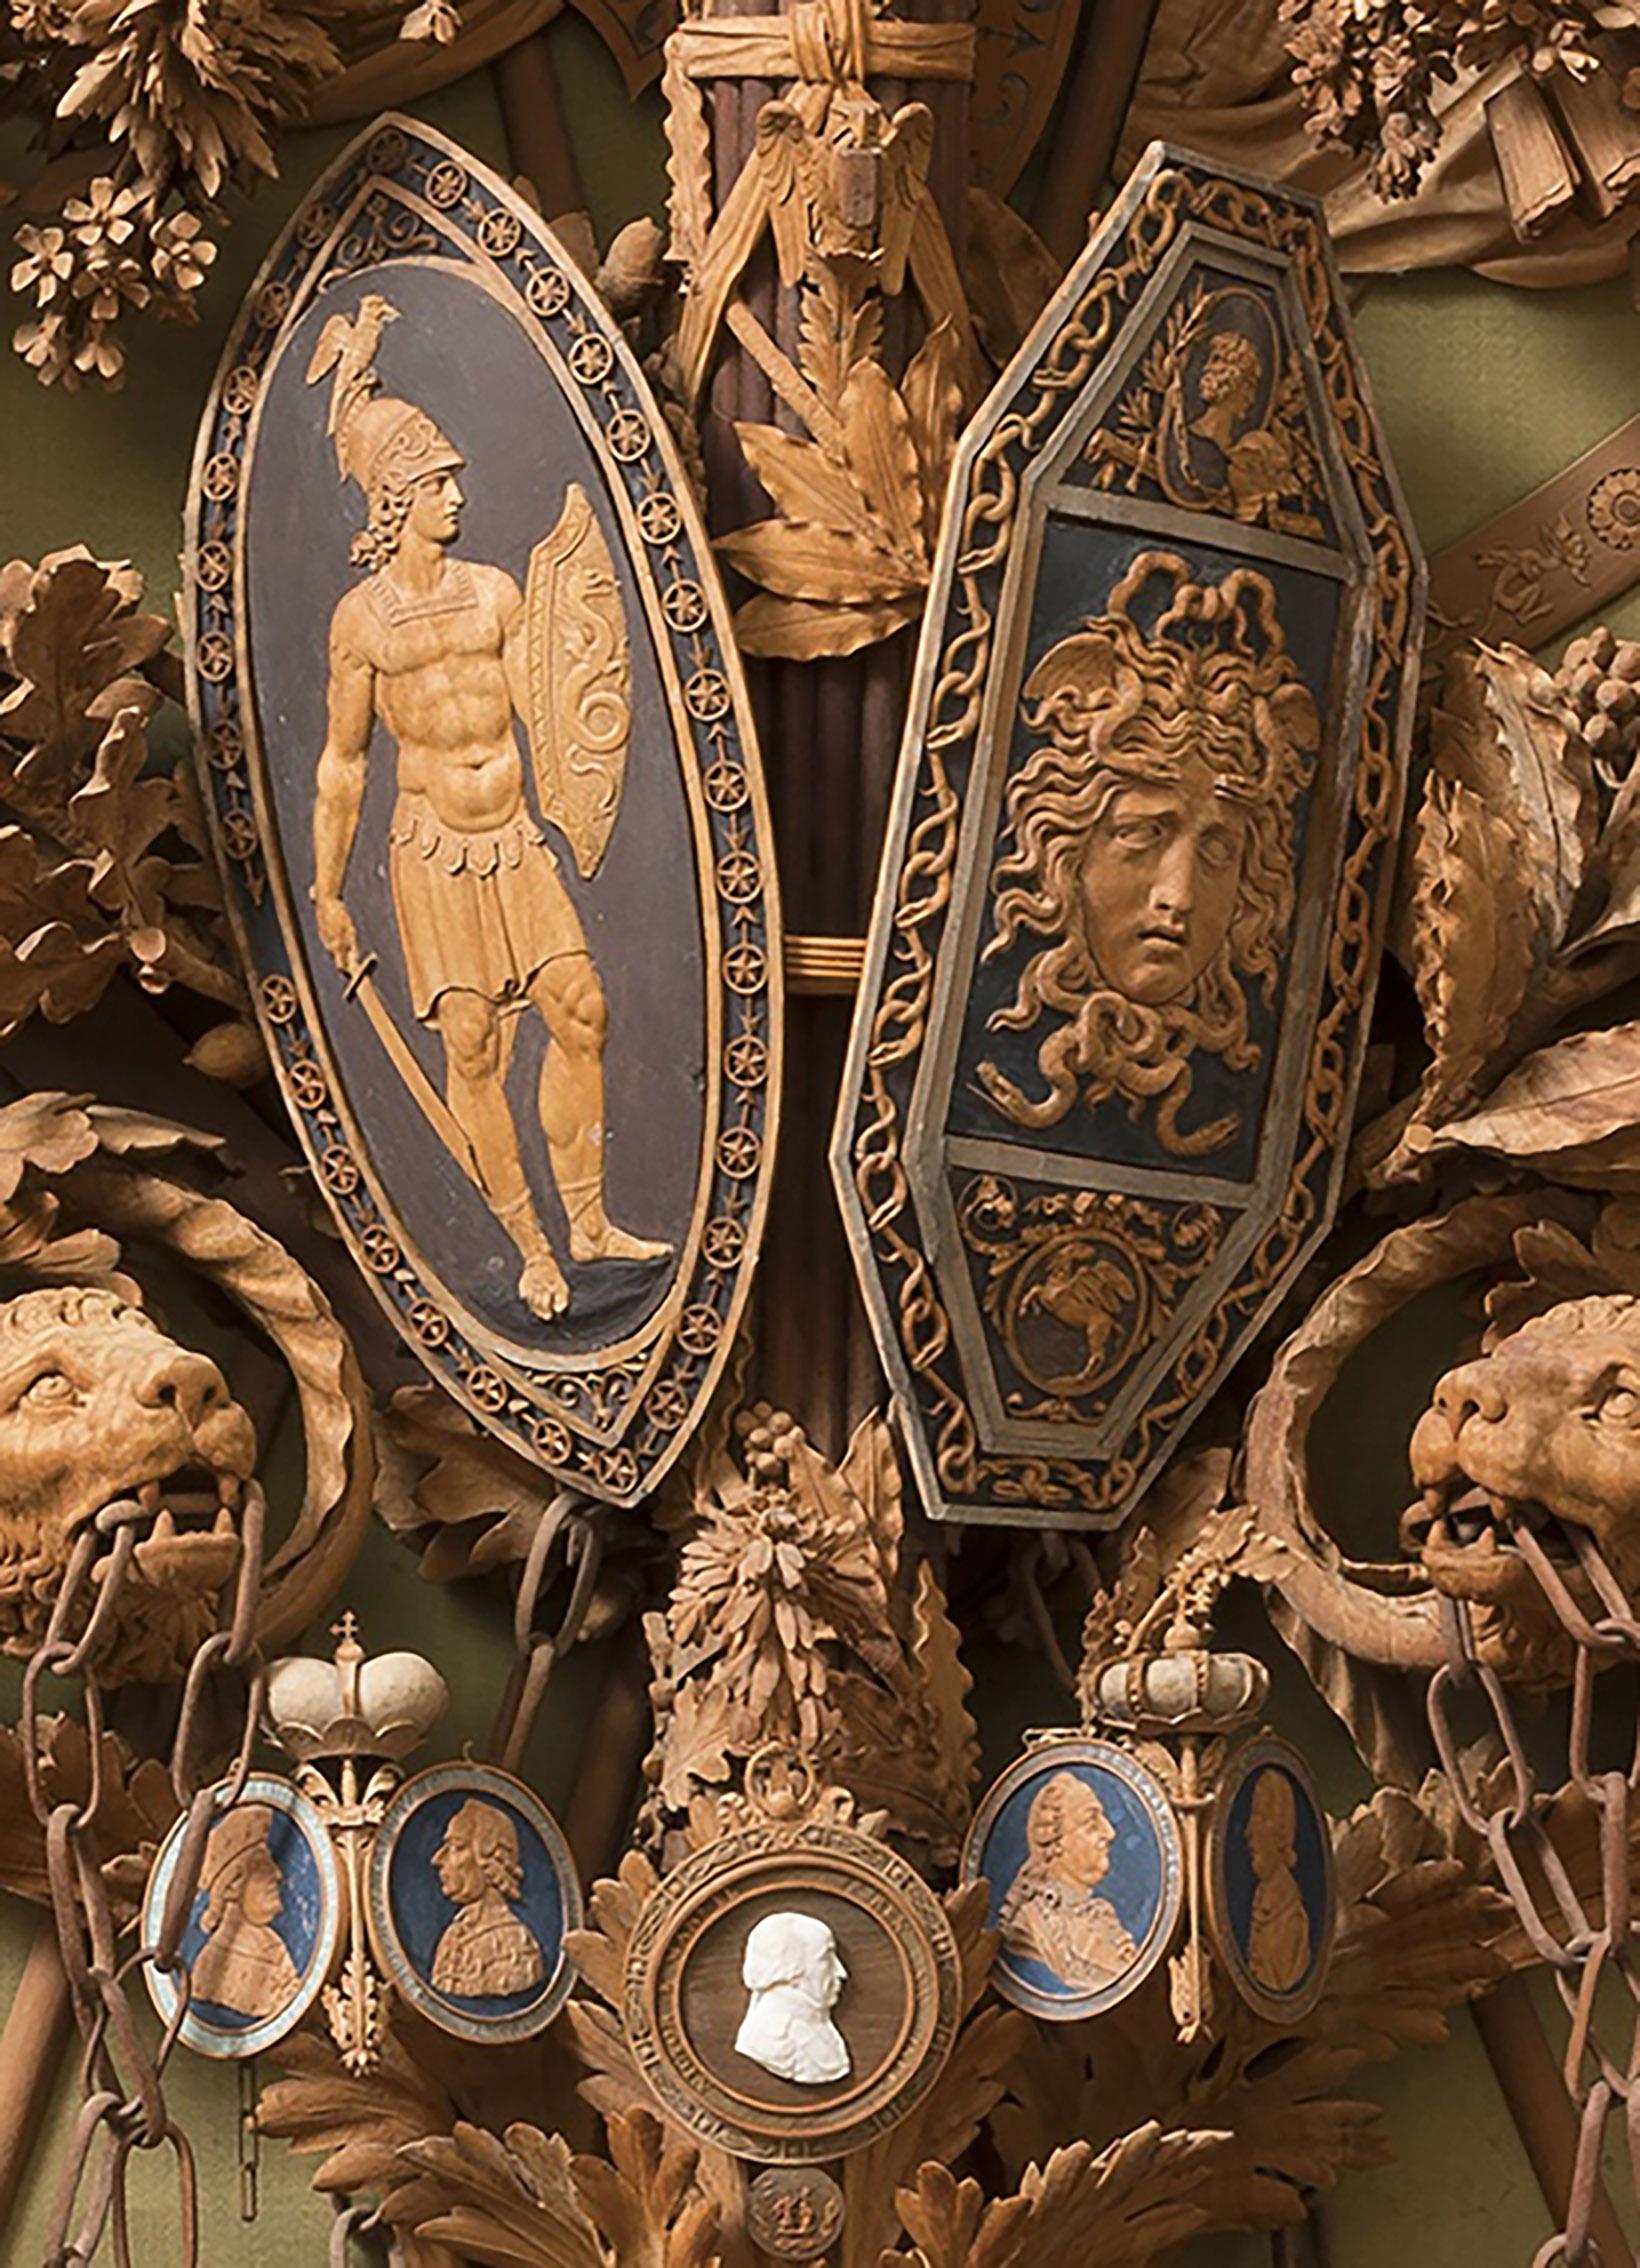 10C Bonzanigo Military trophy 1793-1814 Palazzo Madama Turin detail 2